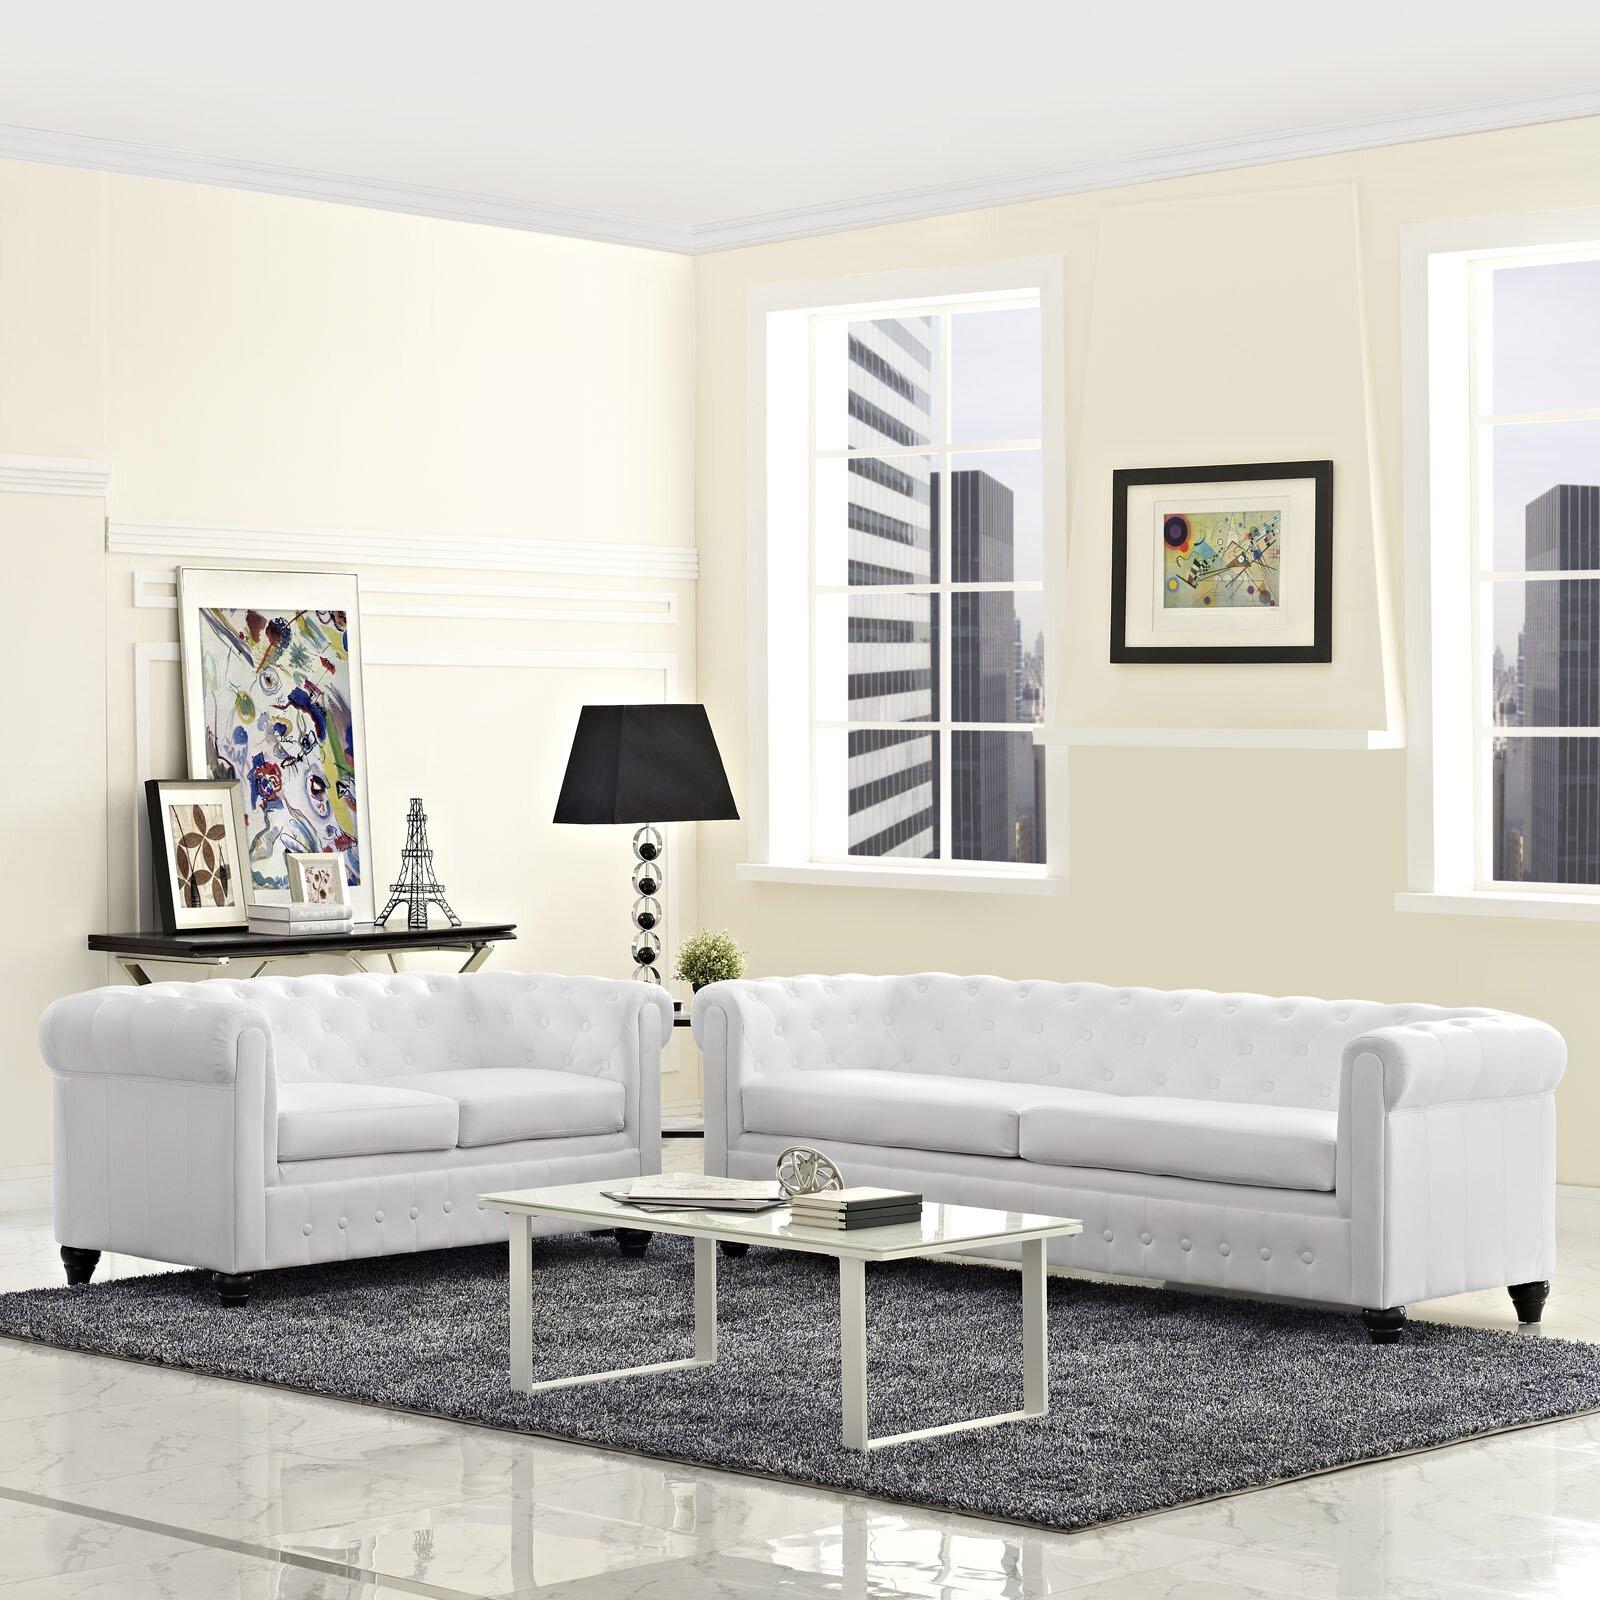 Modway earl 2 piece living room set reviews wayfair for Two piece living room set